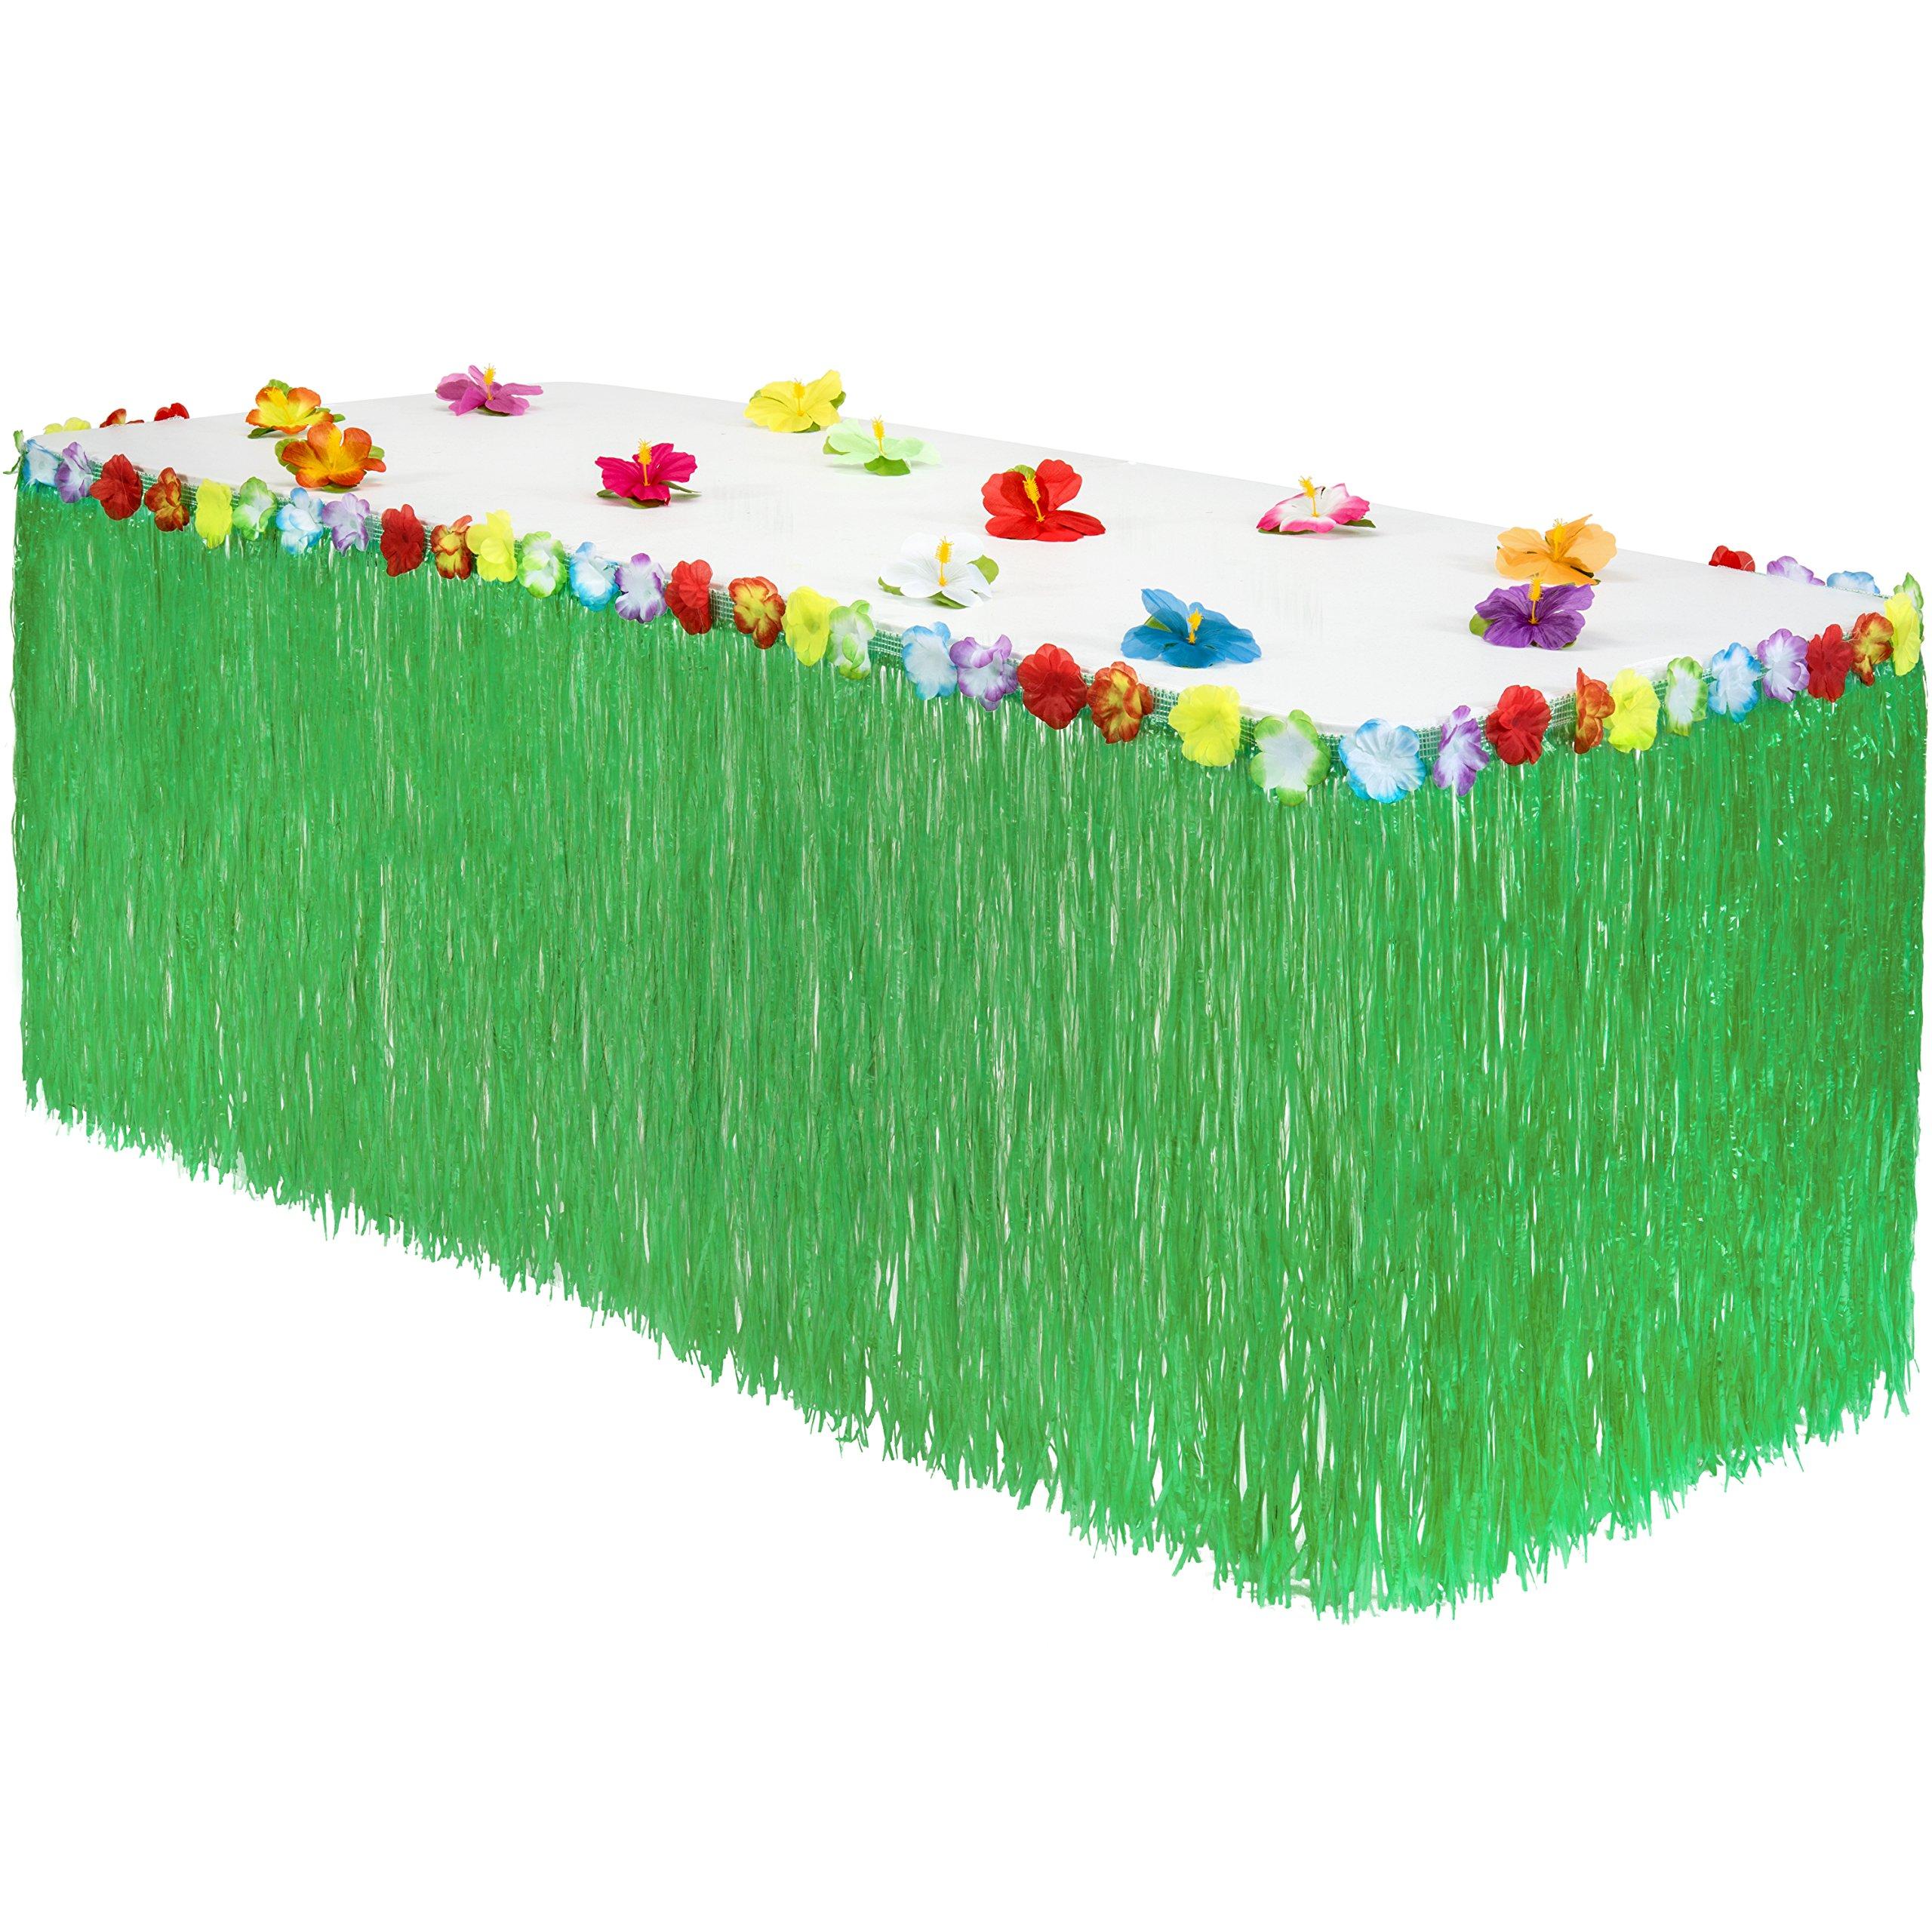 Hawaiian Luau Grass Table Skirt: BONUS 12 Hibiscus Flowers | Includes Adhesive | Perfect Beach, Tiki, Tropical, Island, Party, Luau Decoration 9ft